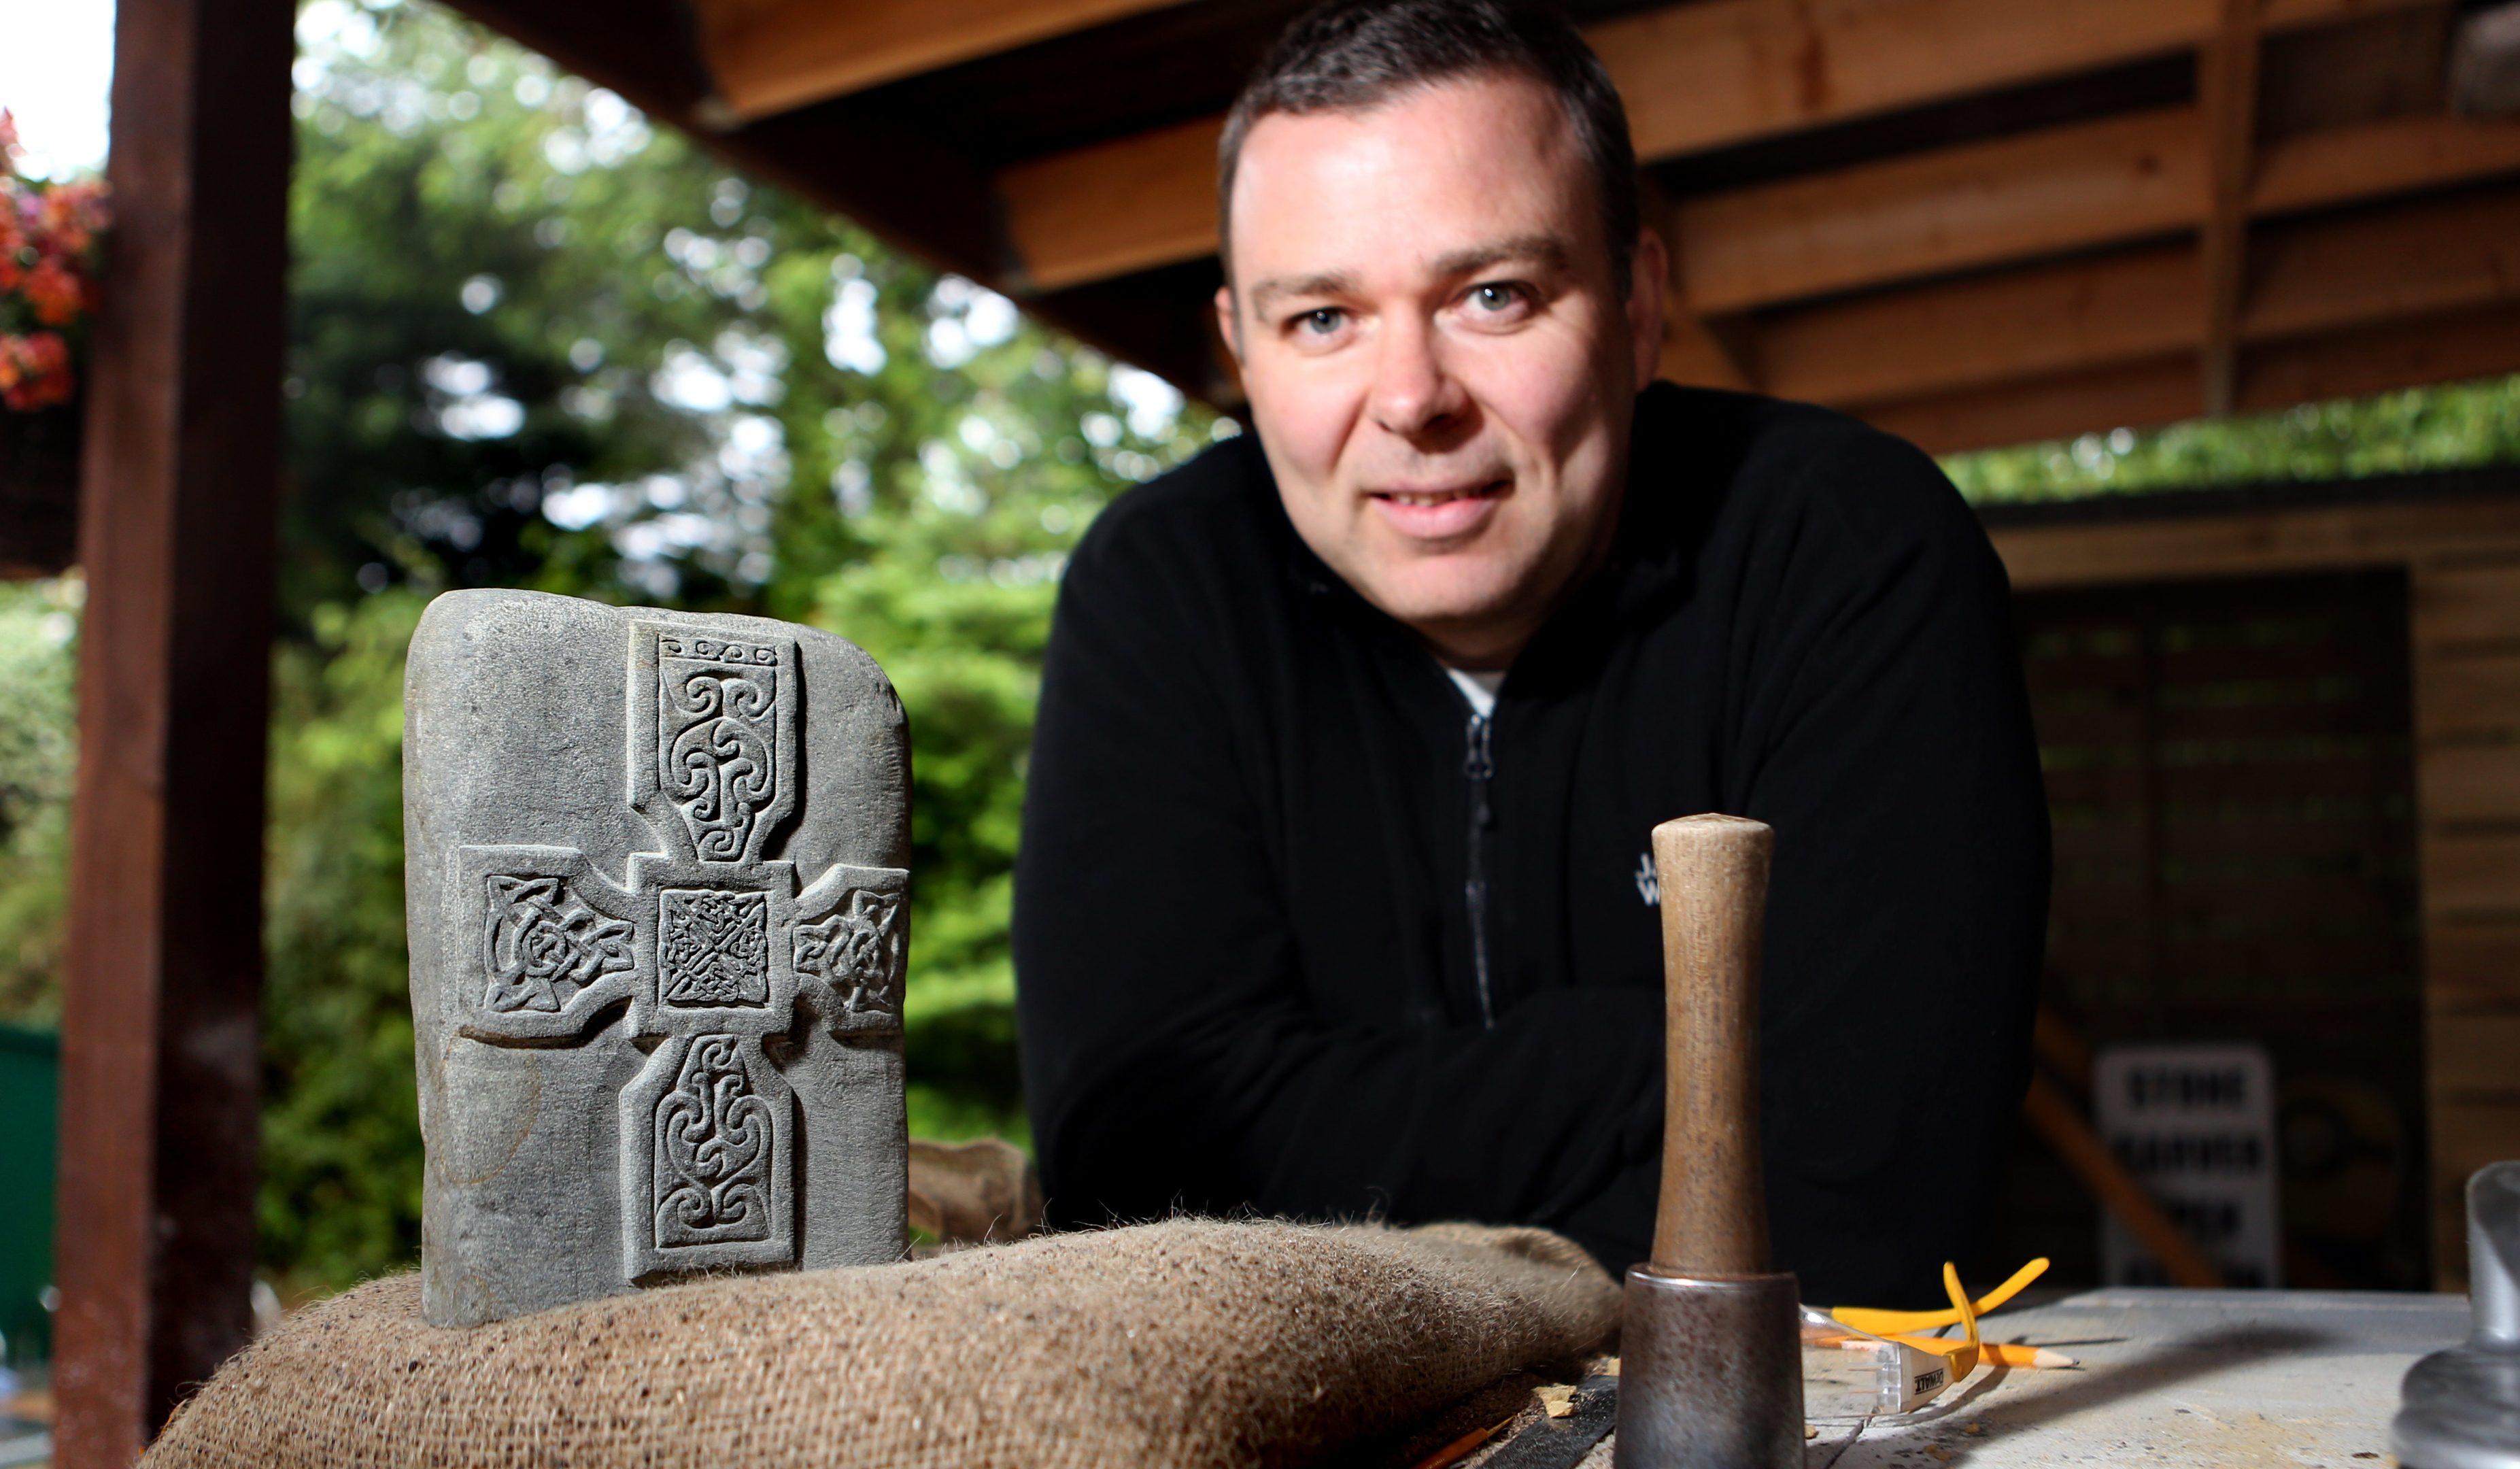 David McGovern at his workshop in Monikie.